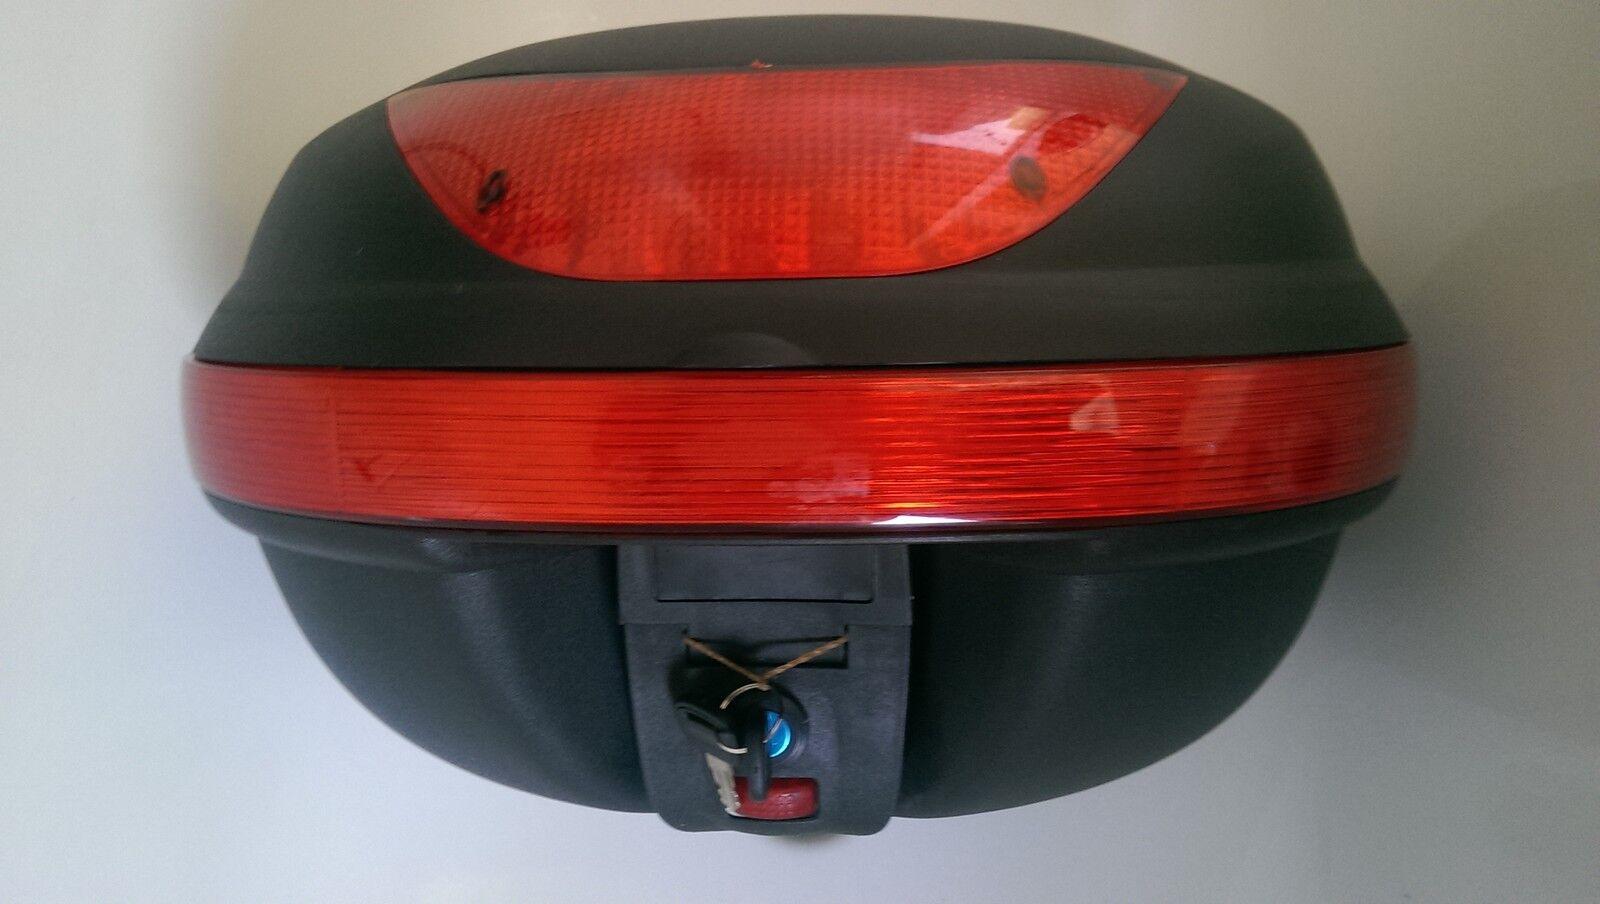 topcase rollerkoffer motorradkoffer top case motorrad. Black Bedroom Furniture Sets. Home Design Ideas